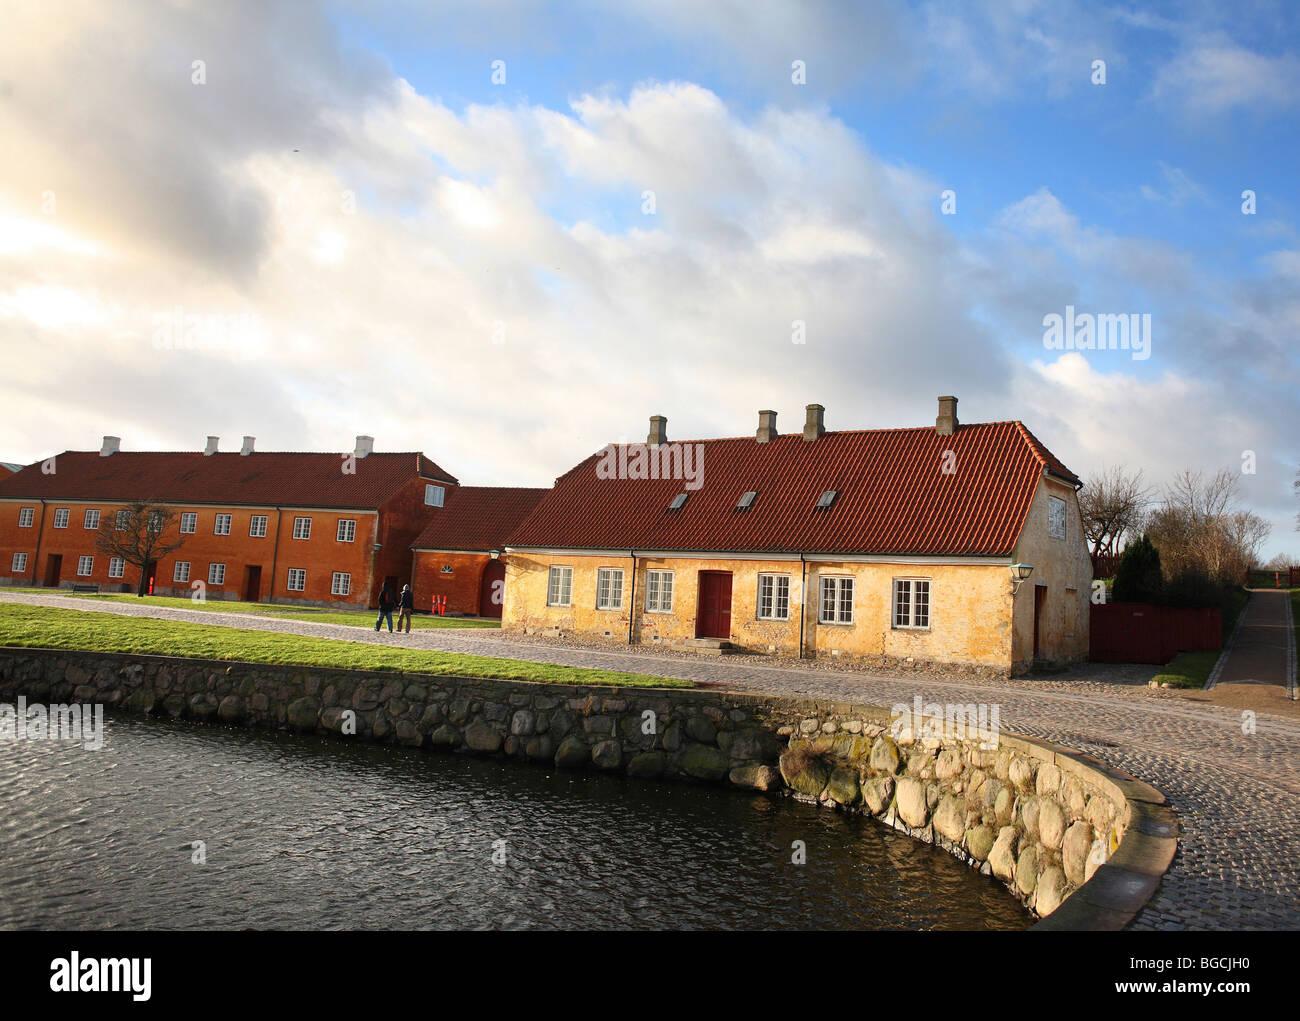 Kronborg Castle in Helsingør on the island of Zealand (Sjælland) in Denmark, house at the entrance - Stock Image